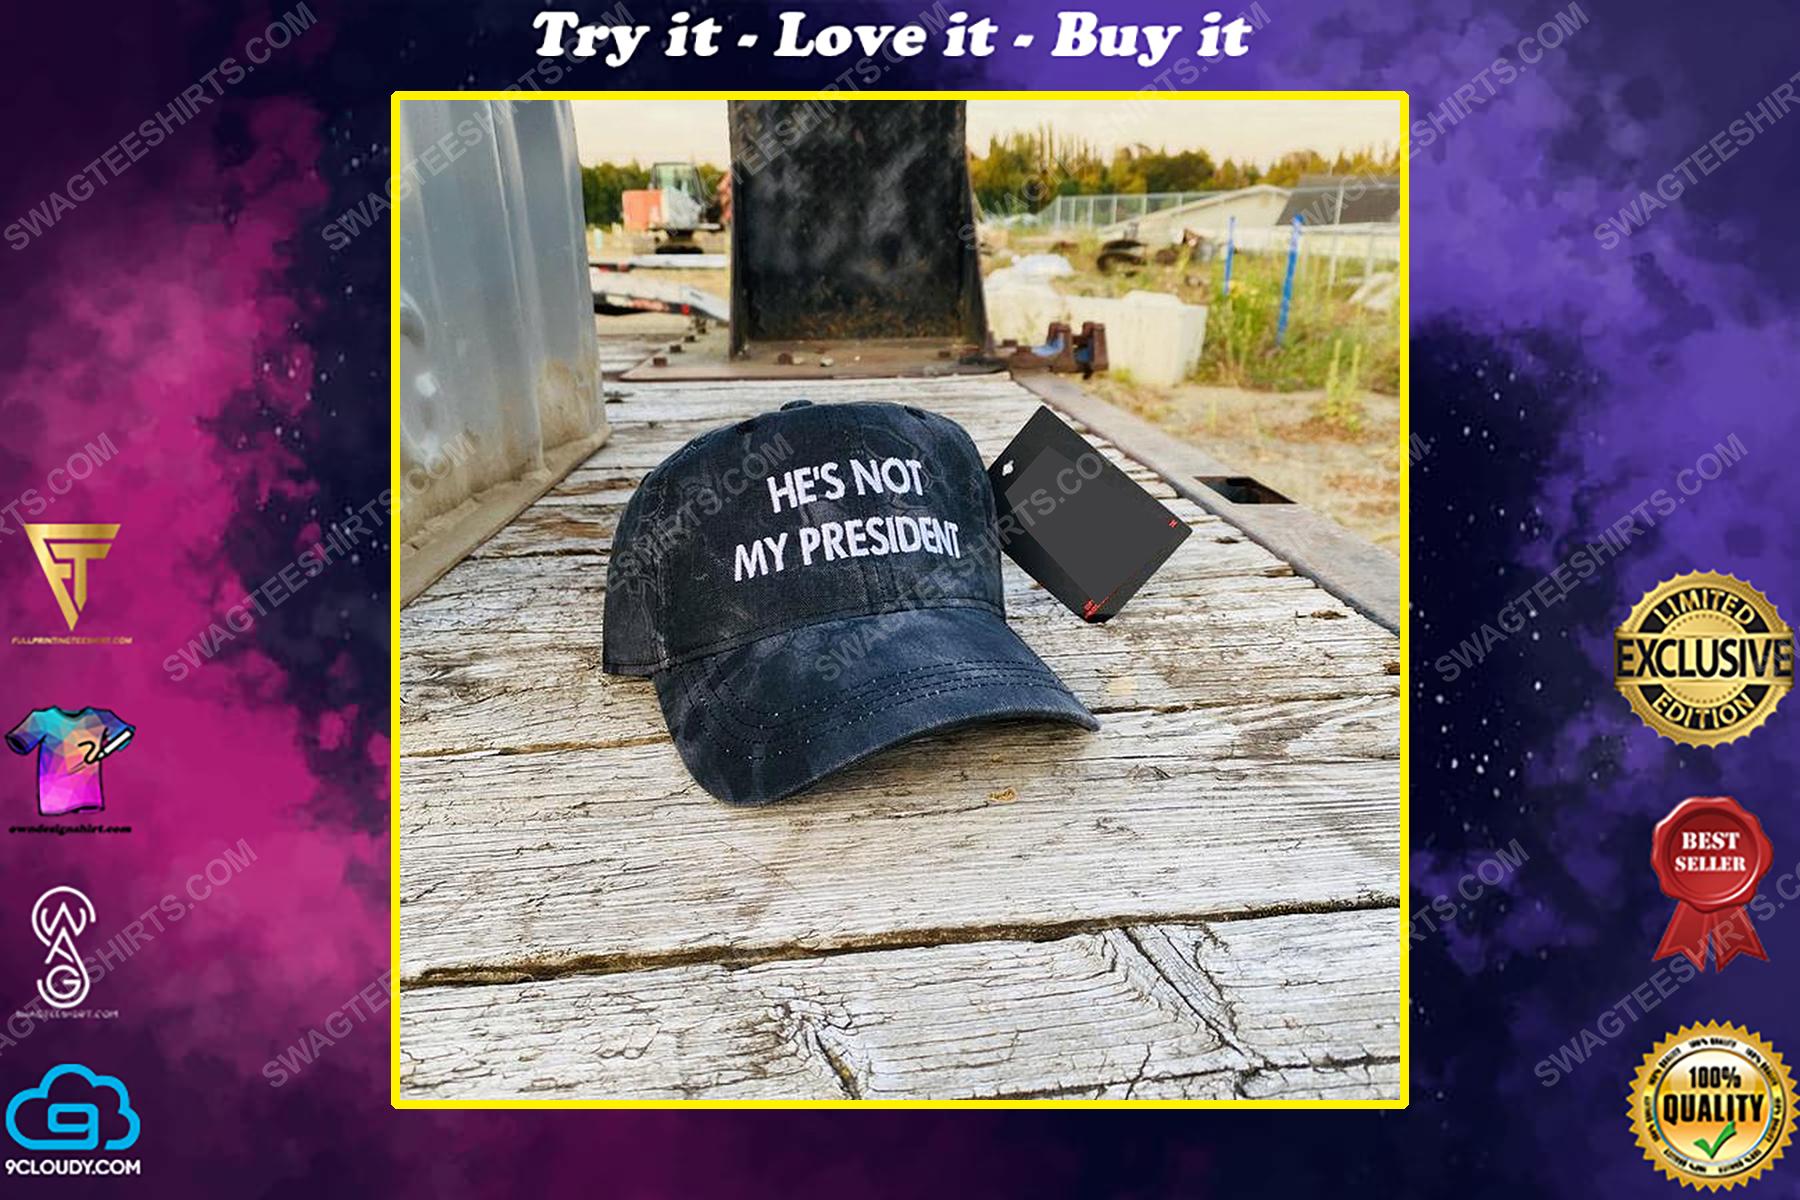 He's not my president full print classic hat